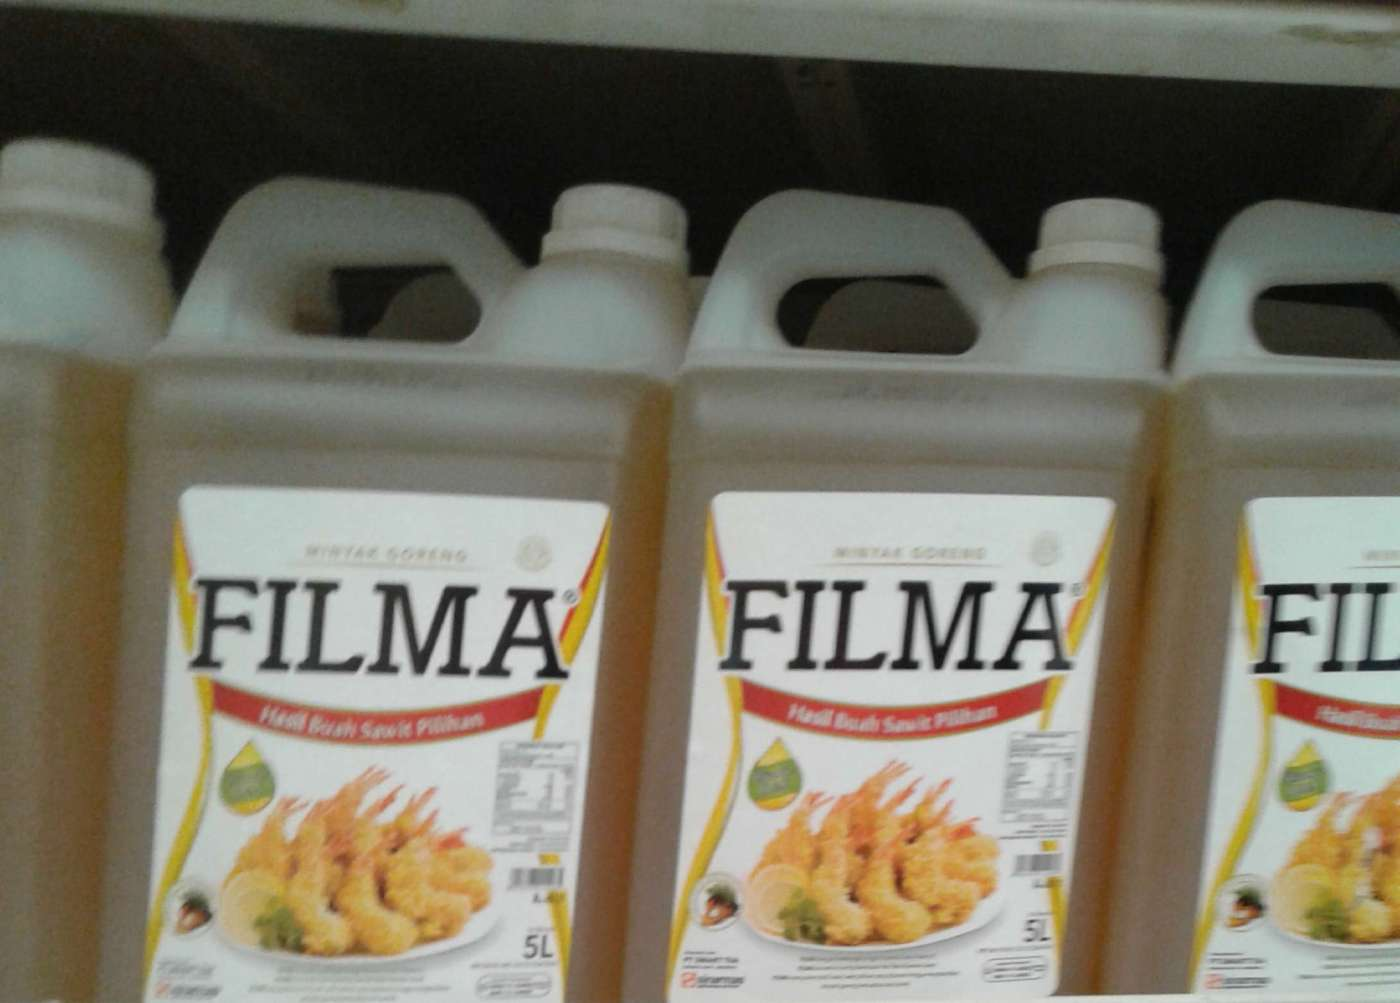 Distributor Sembako Jakarta Daftar Harga Minyak Goreng Kemasan Sunco 2 L 1 Dus 6 Pcs Email Distributormmsgmailcom